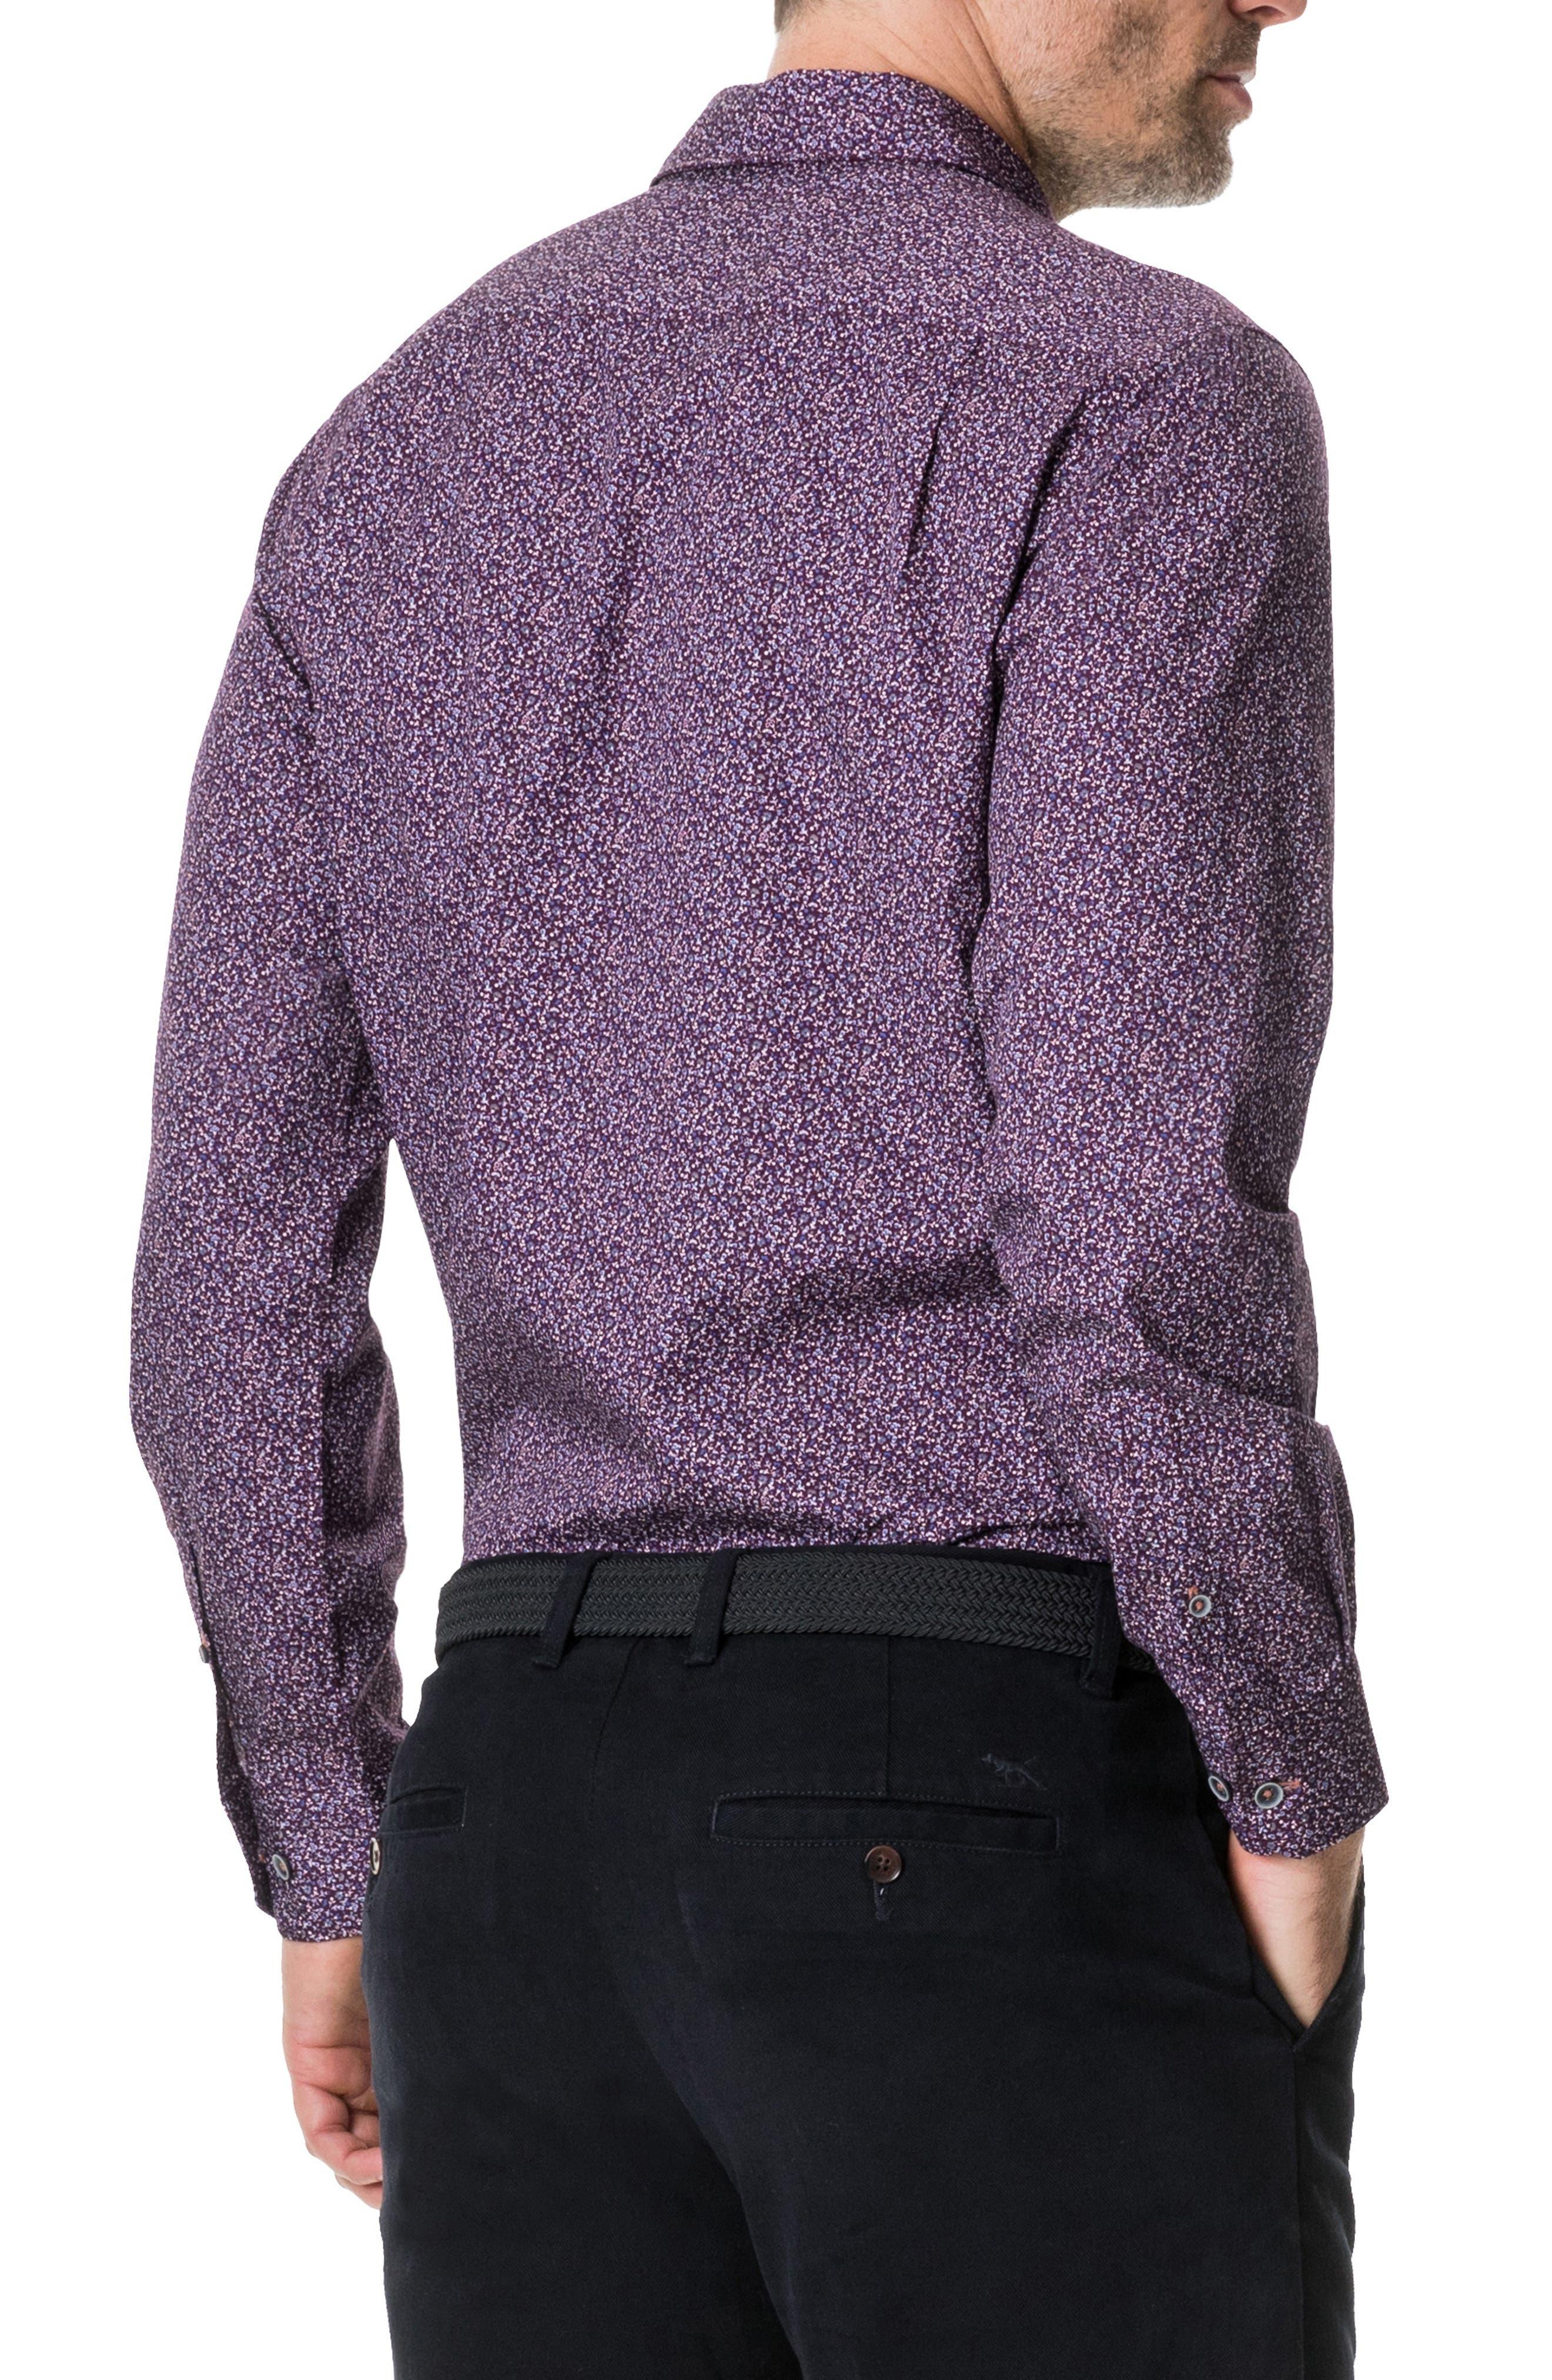 RODD & GUNN, Scotland Street Regular Fit Floral Sport Shirt, Alternate thumbnail 3, color, PLUM PURPLE